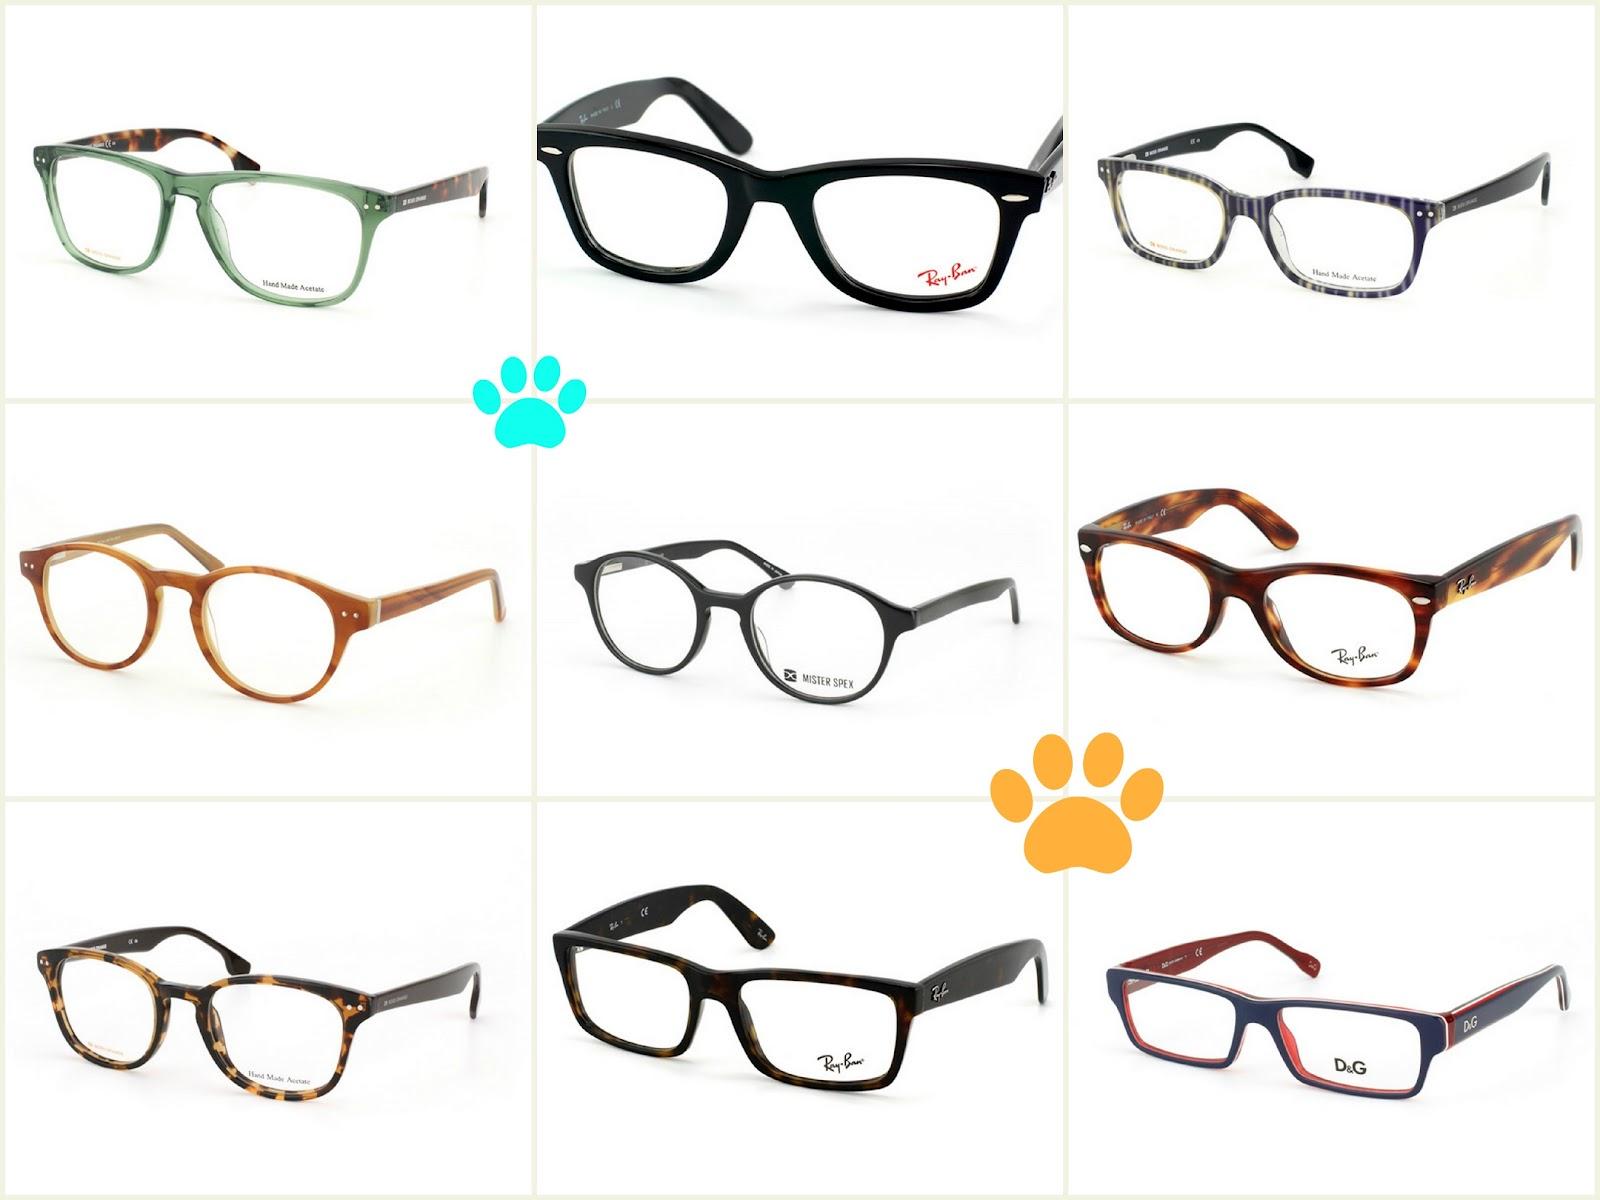 f9f842b972 Javito&Cool Moda masculina: Mister Spex: my new sunglasses